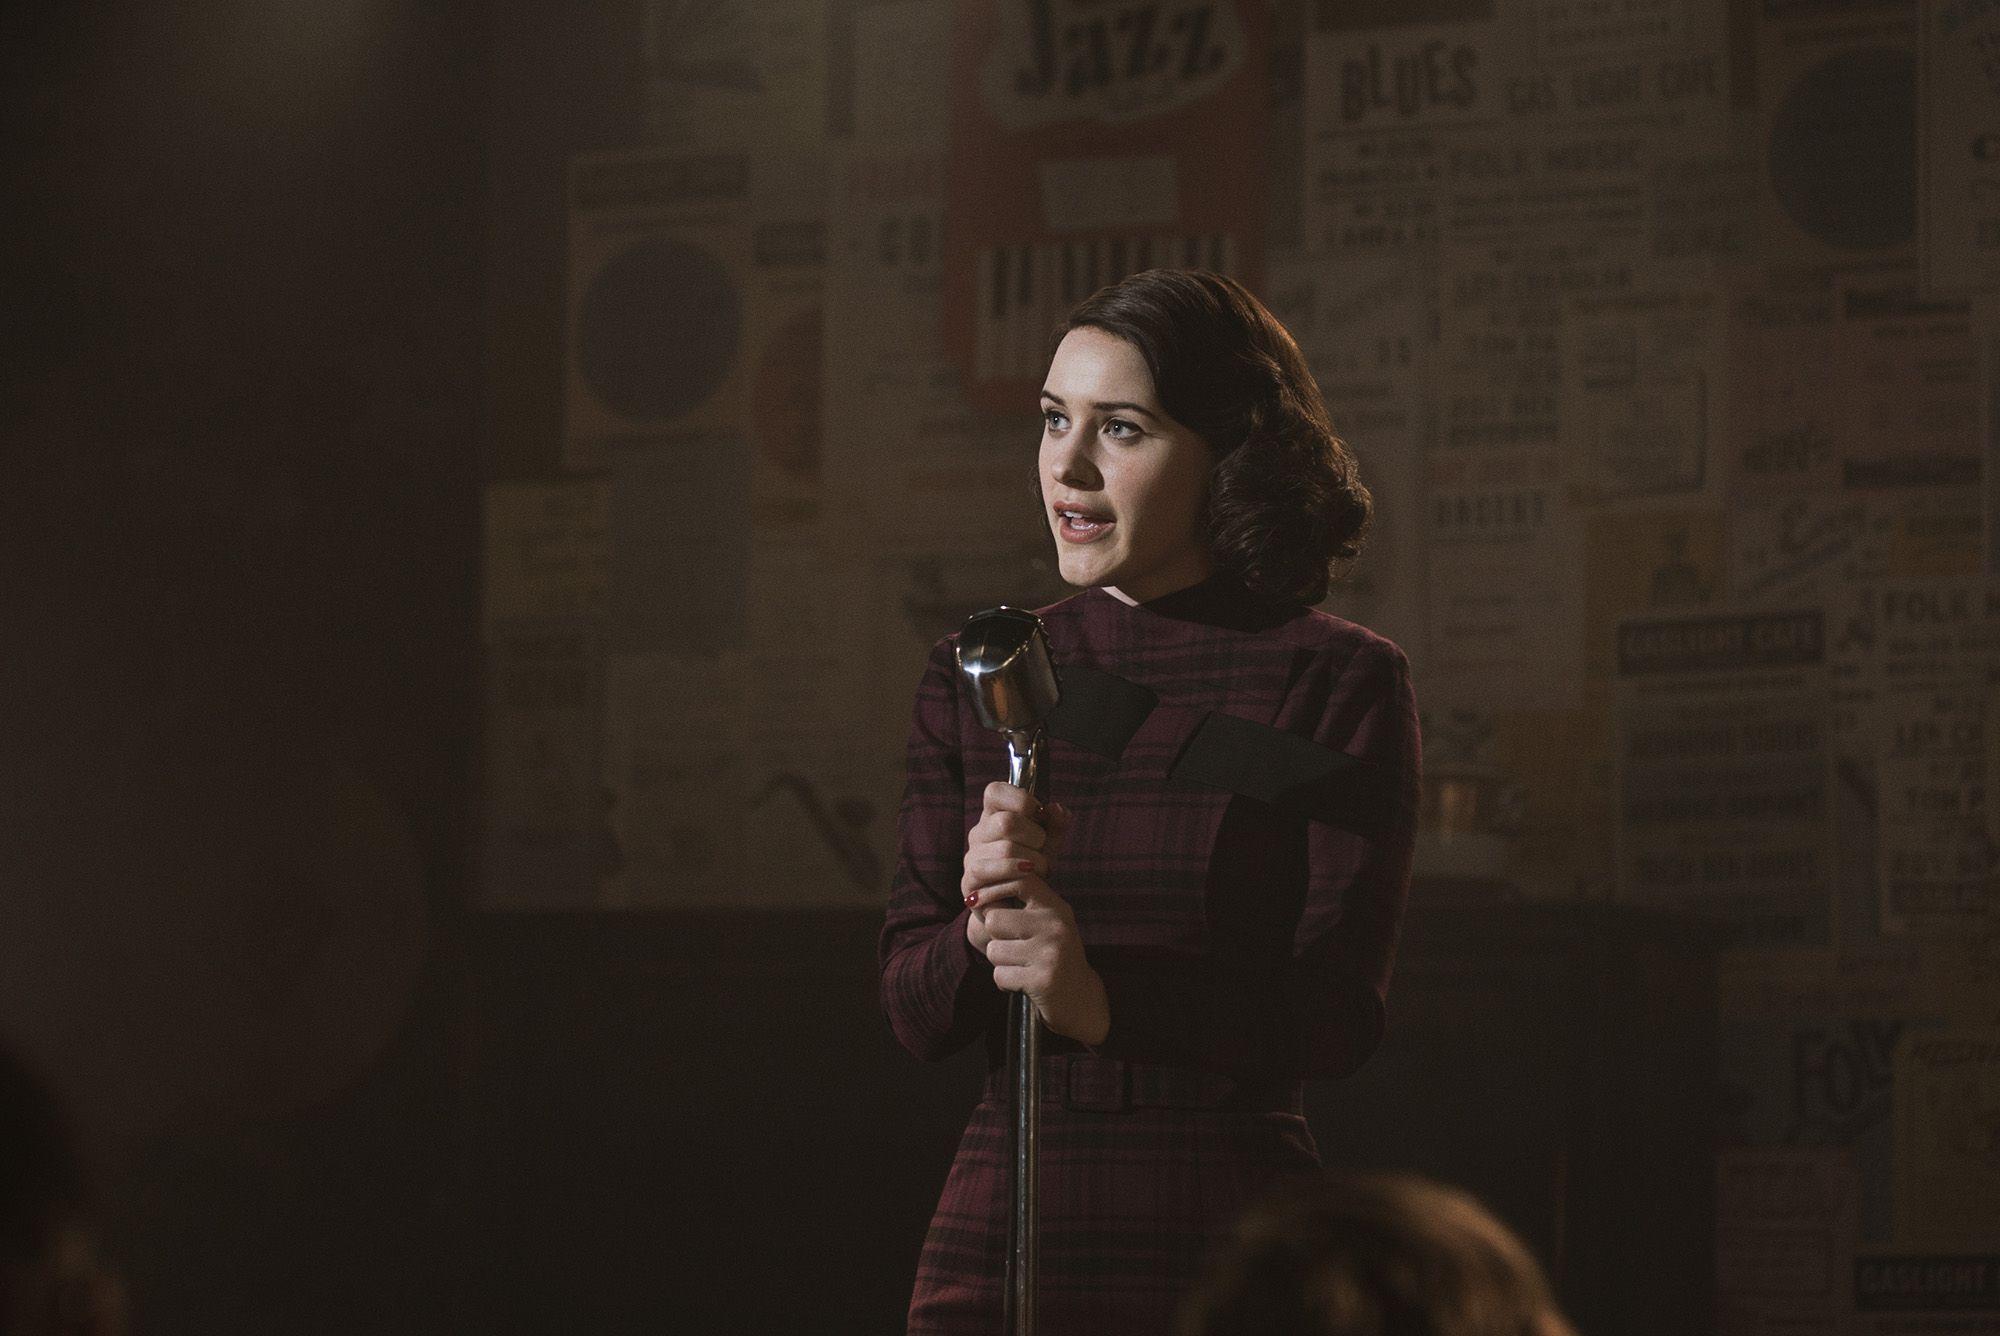 Rachel Brosnahan Makes A Comedy Comeback In New Trailer For The Marvelous Mrs Maisel Season 2 New Trailers Latest Entertainment News Rachel Brosnahan